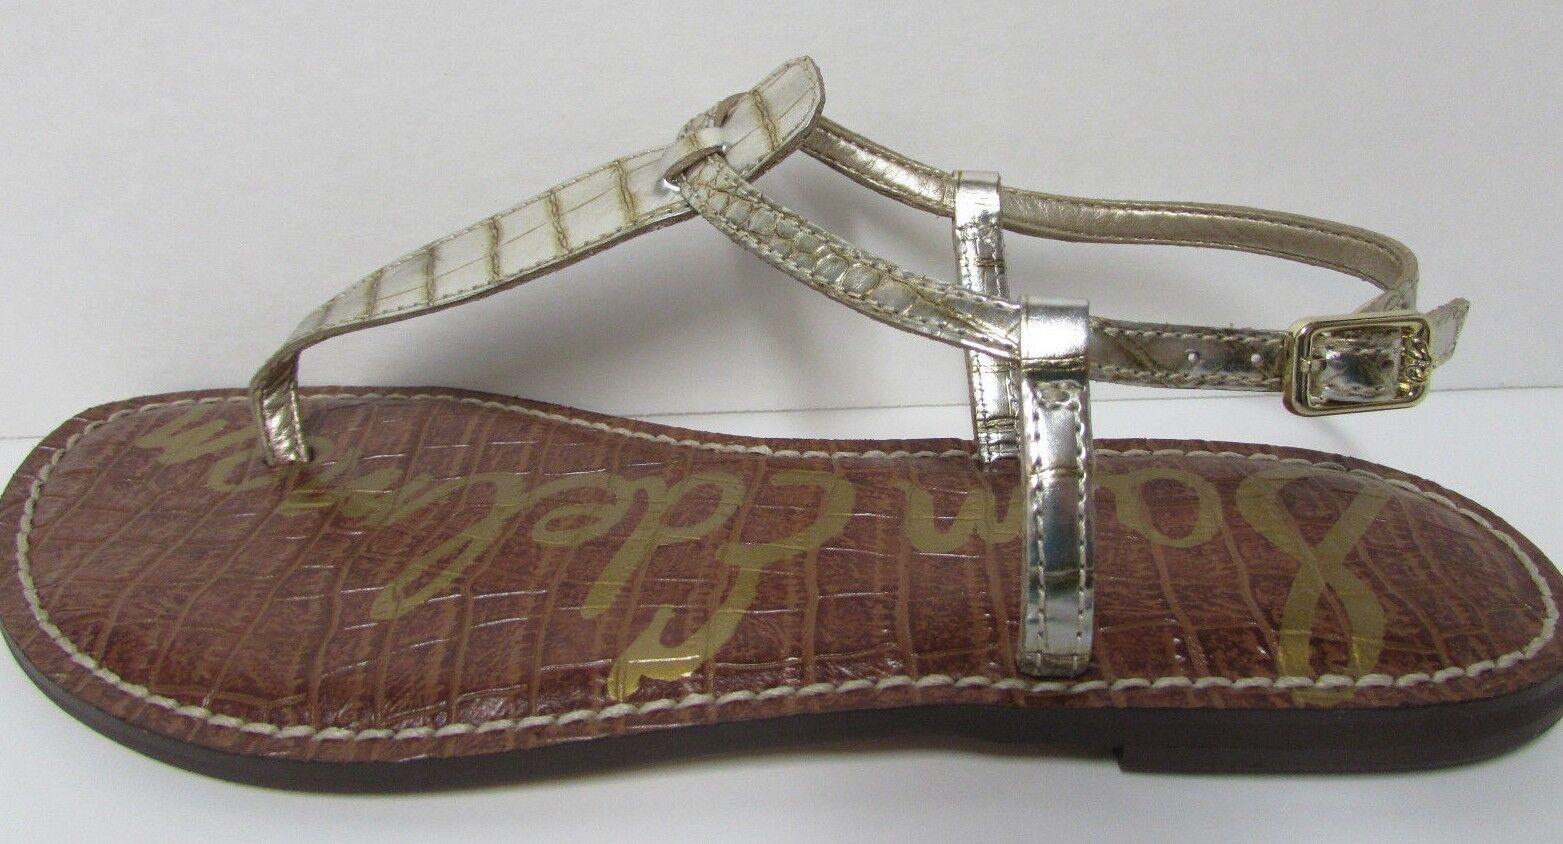 Sam Edelman Größe 8 Gold Croc Sandale New Damenschuhe Schuhes